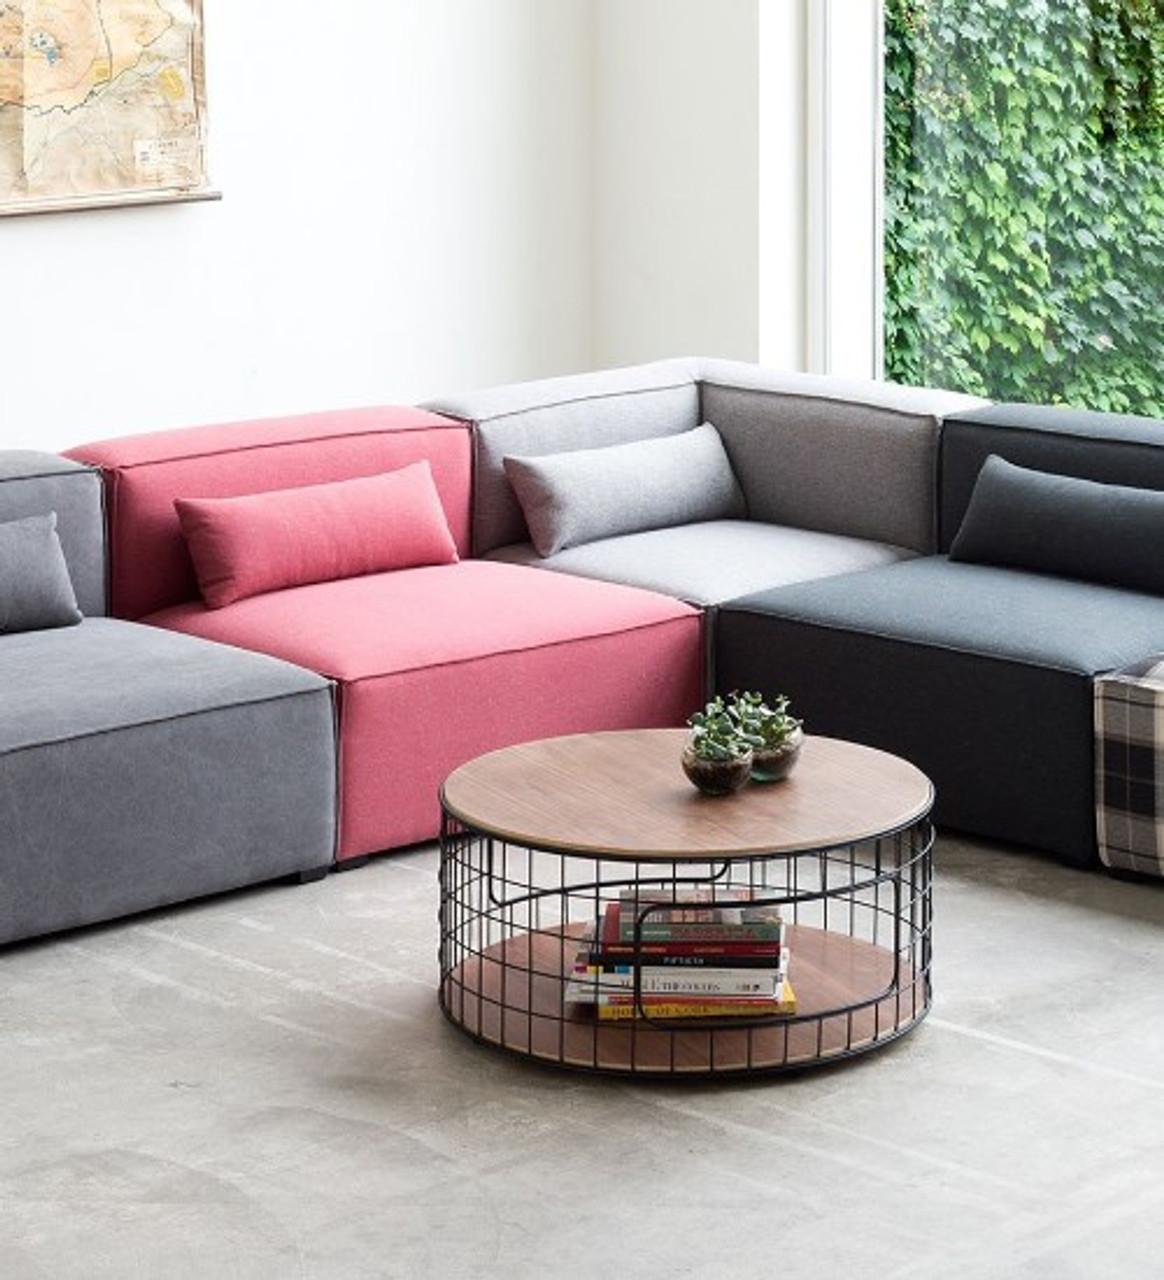 Designer Guide to Best Modular Sectional Sofas!